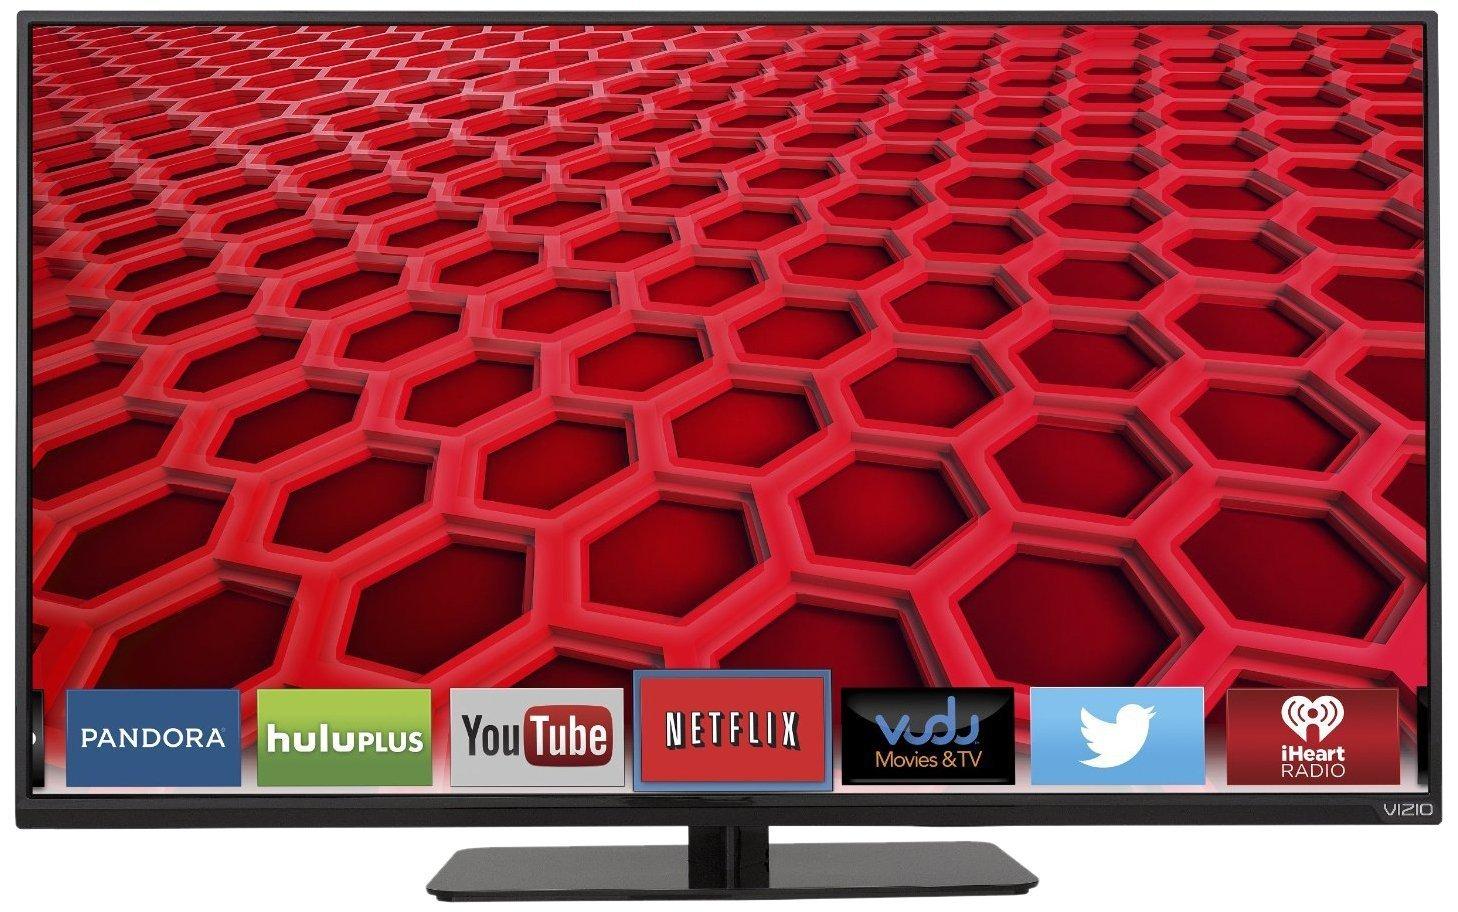 Amazoncom VIZIO E400iB2 40Inch 1080p Smart LED HDTV 2014 Model